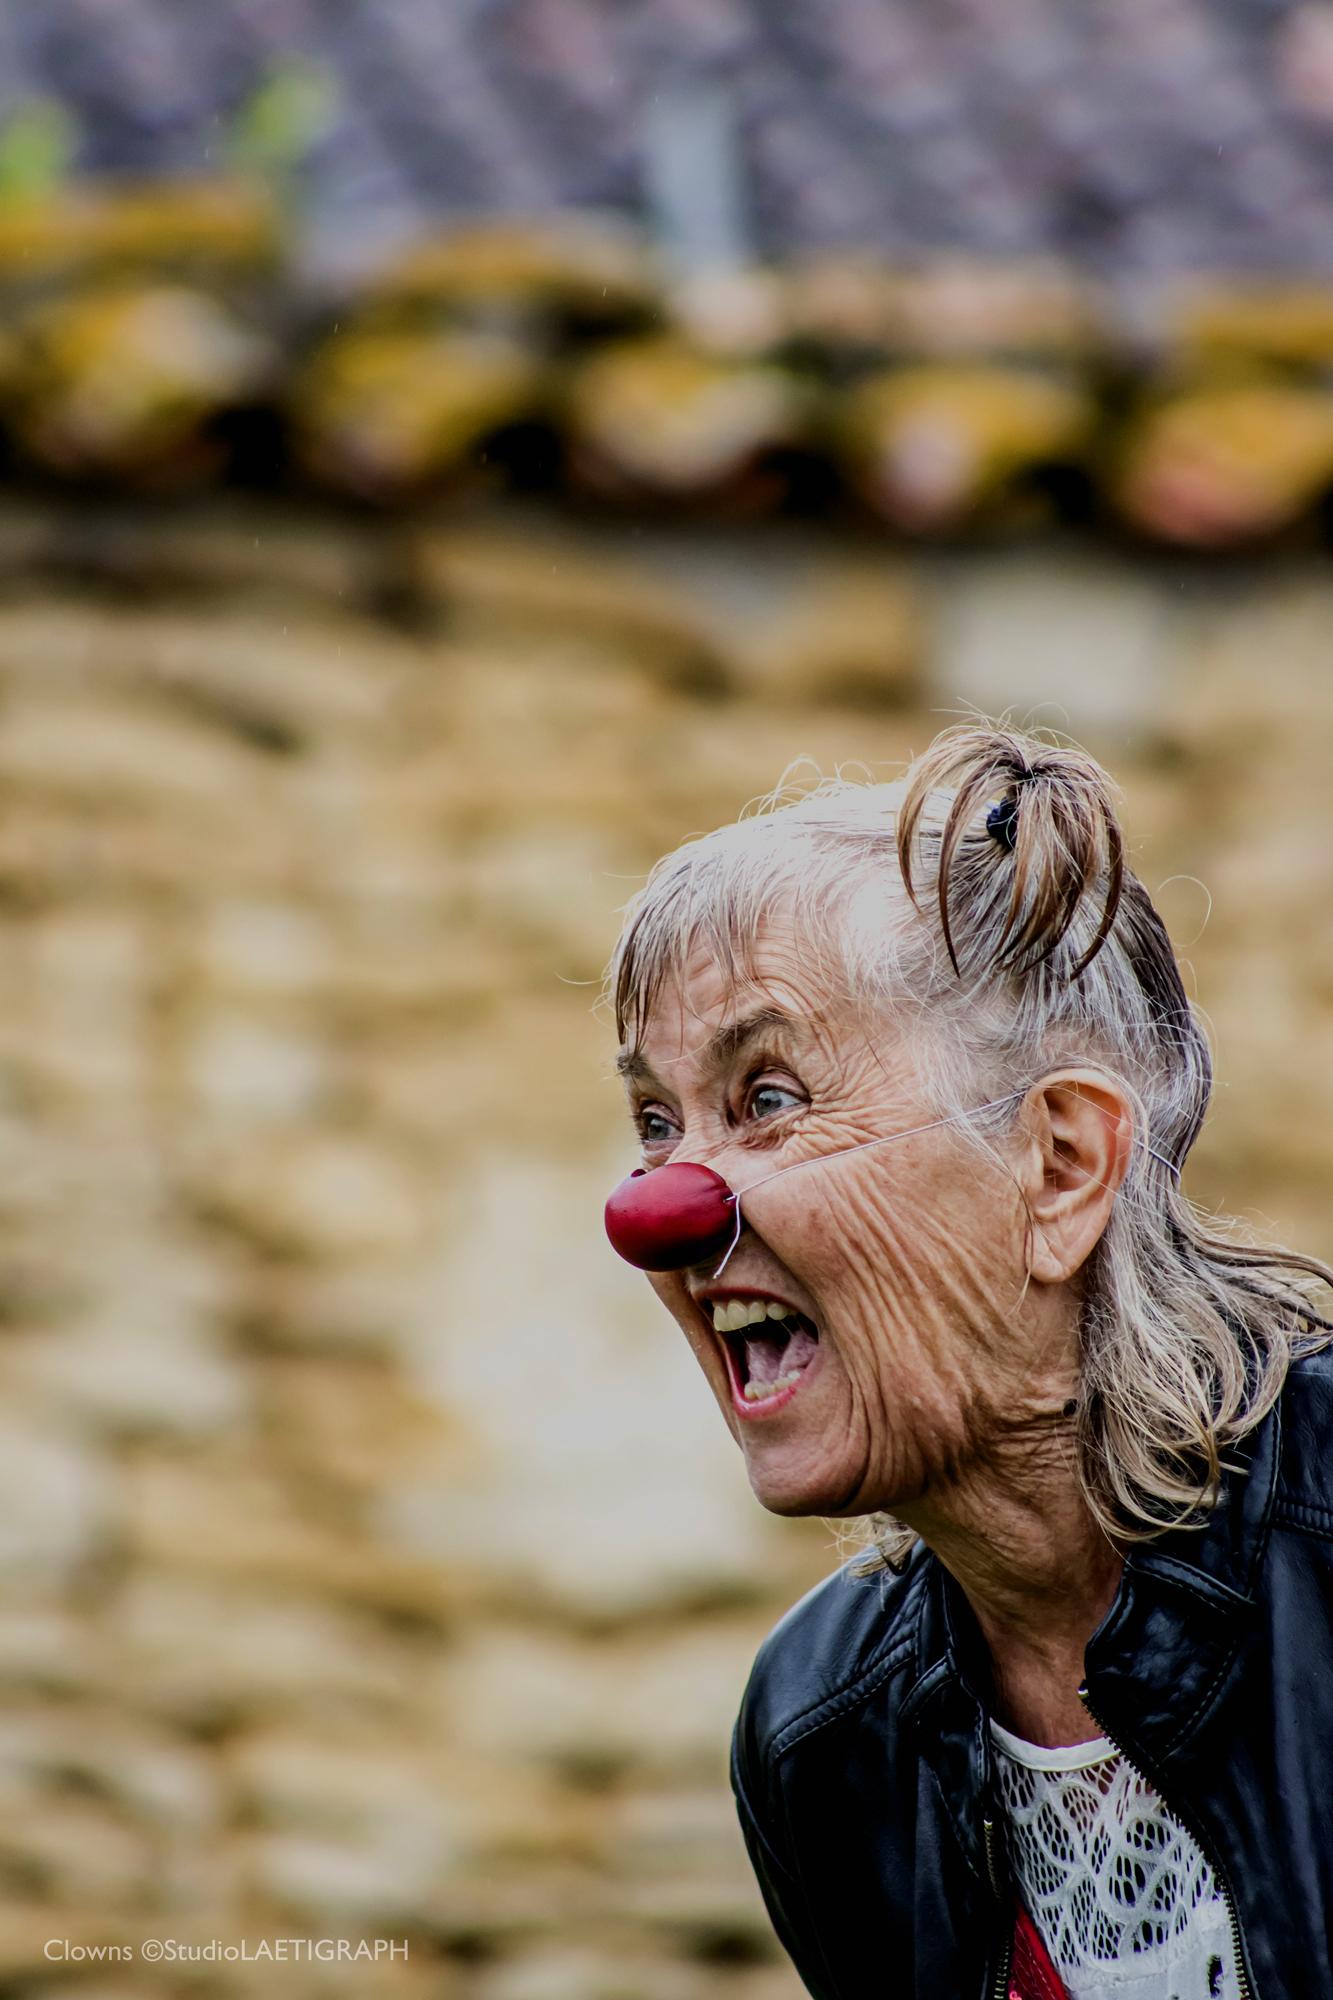 LMDCB21_clowns-136_1